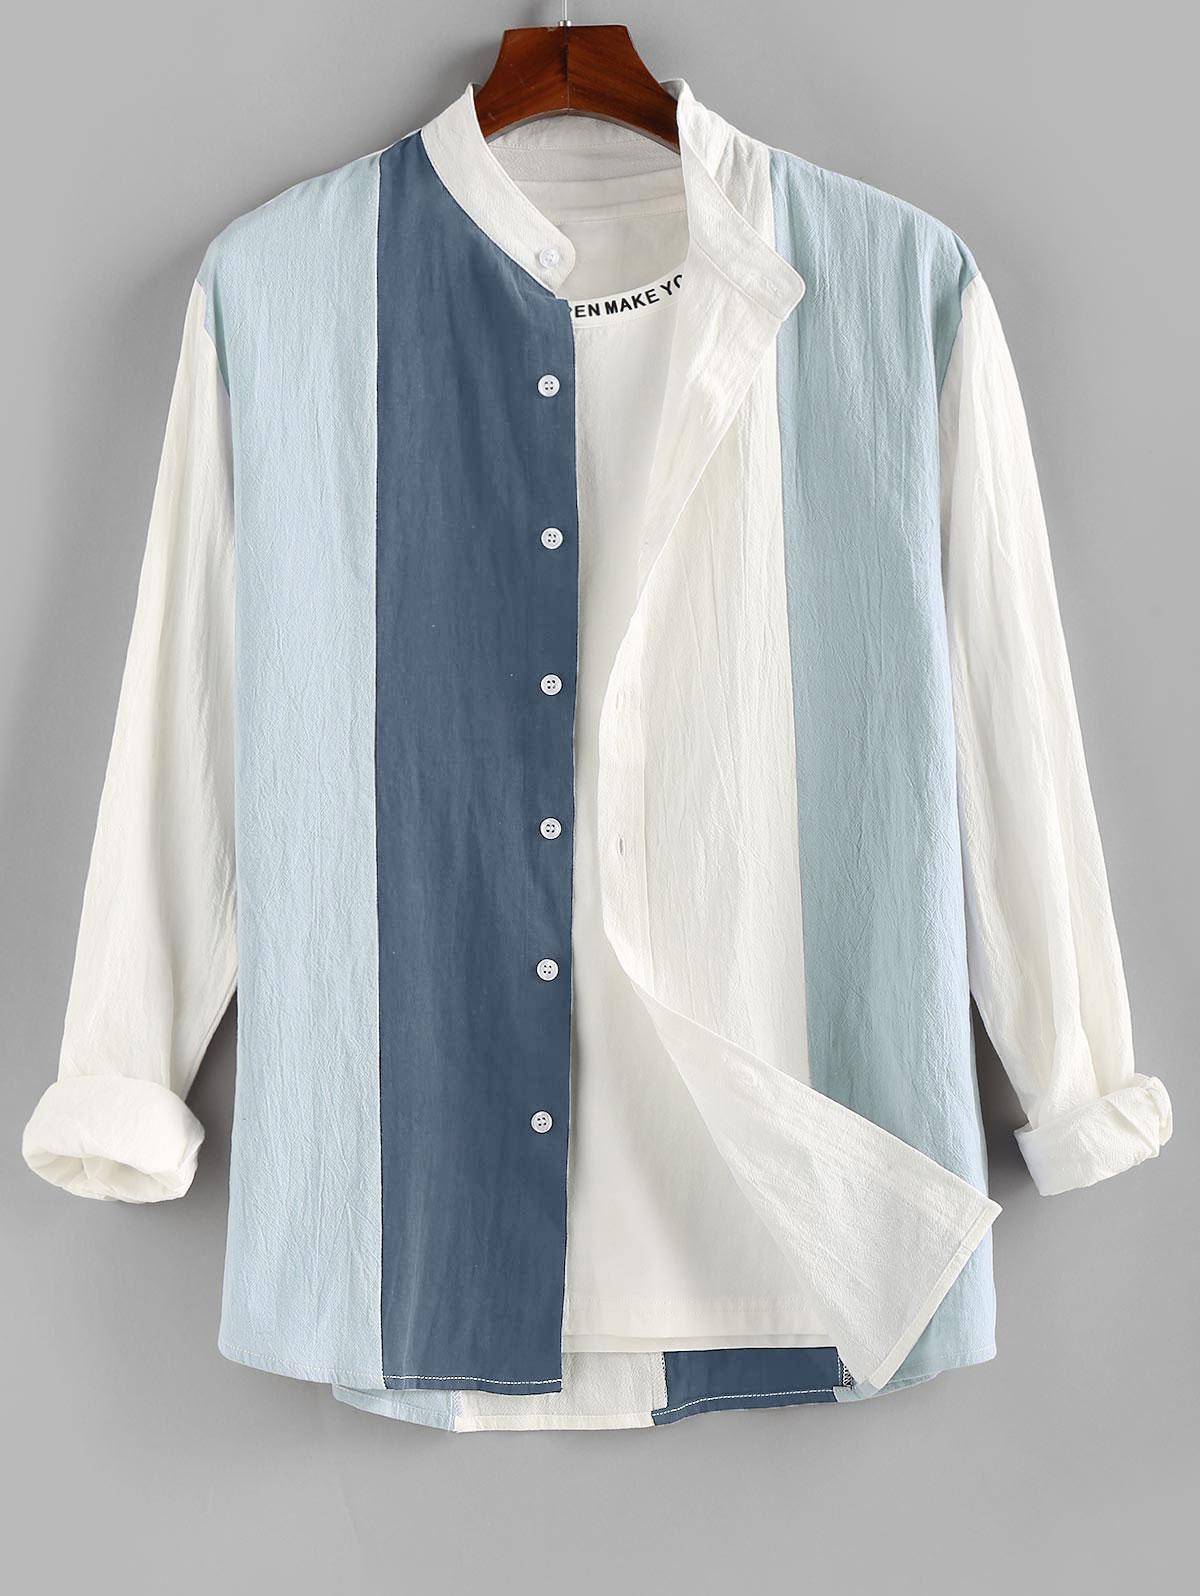 Chemise Boutonnée Contrastée à Manches Longues - ZAFUL - Modalova